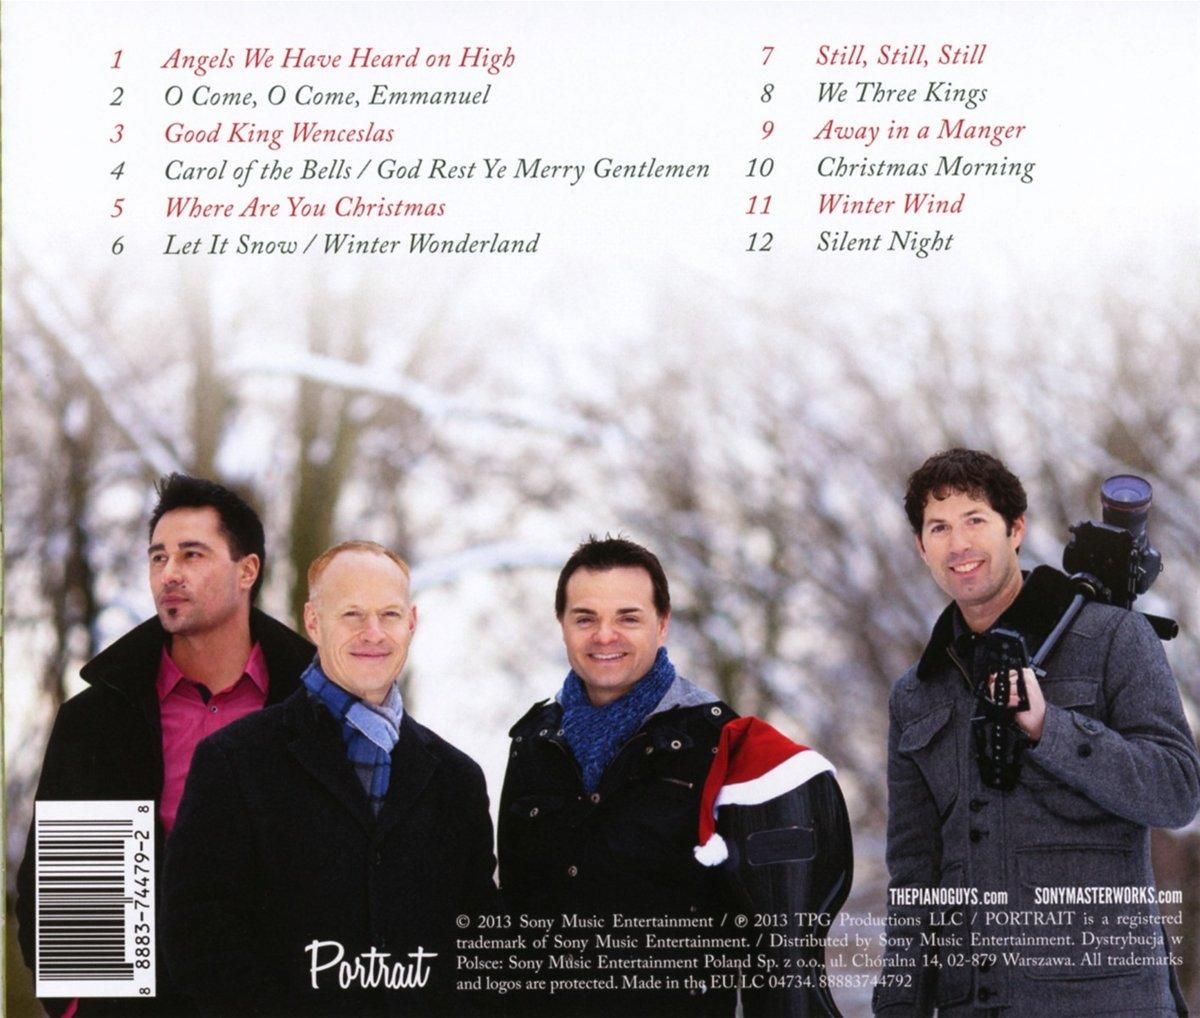 Piano Guys - A Family Christmas - Amazon.com Music